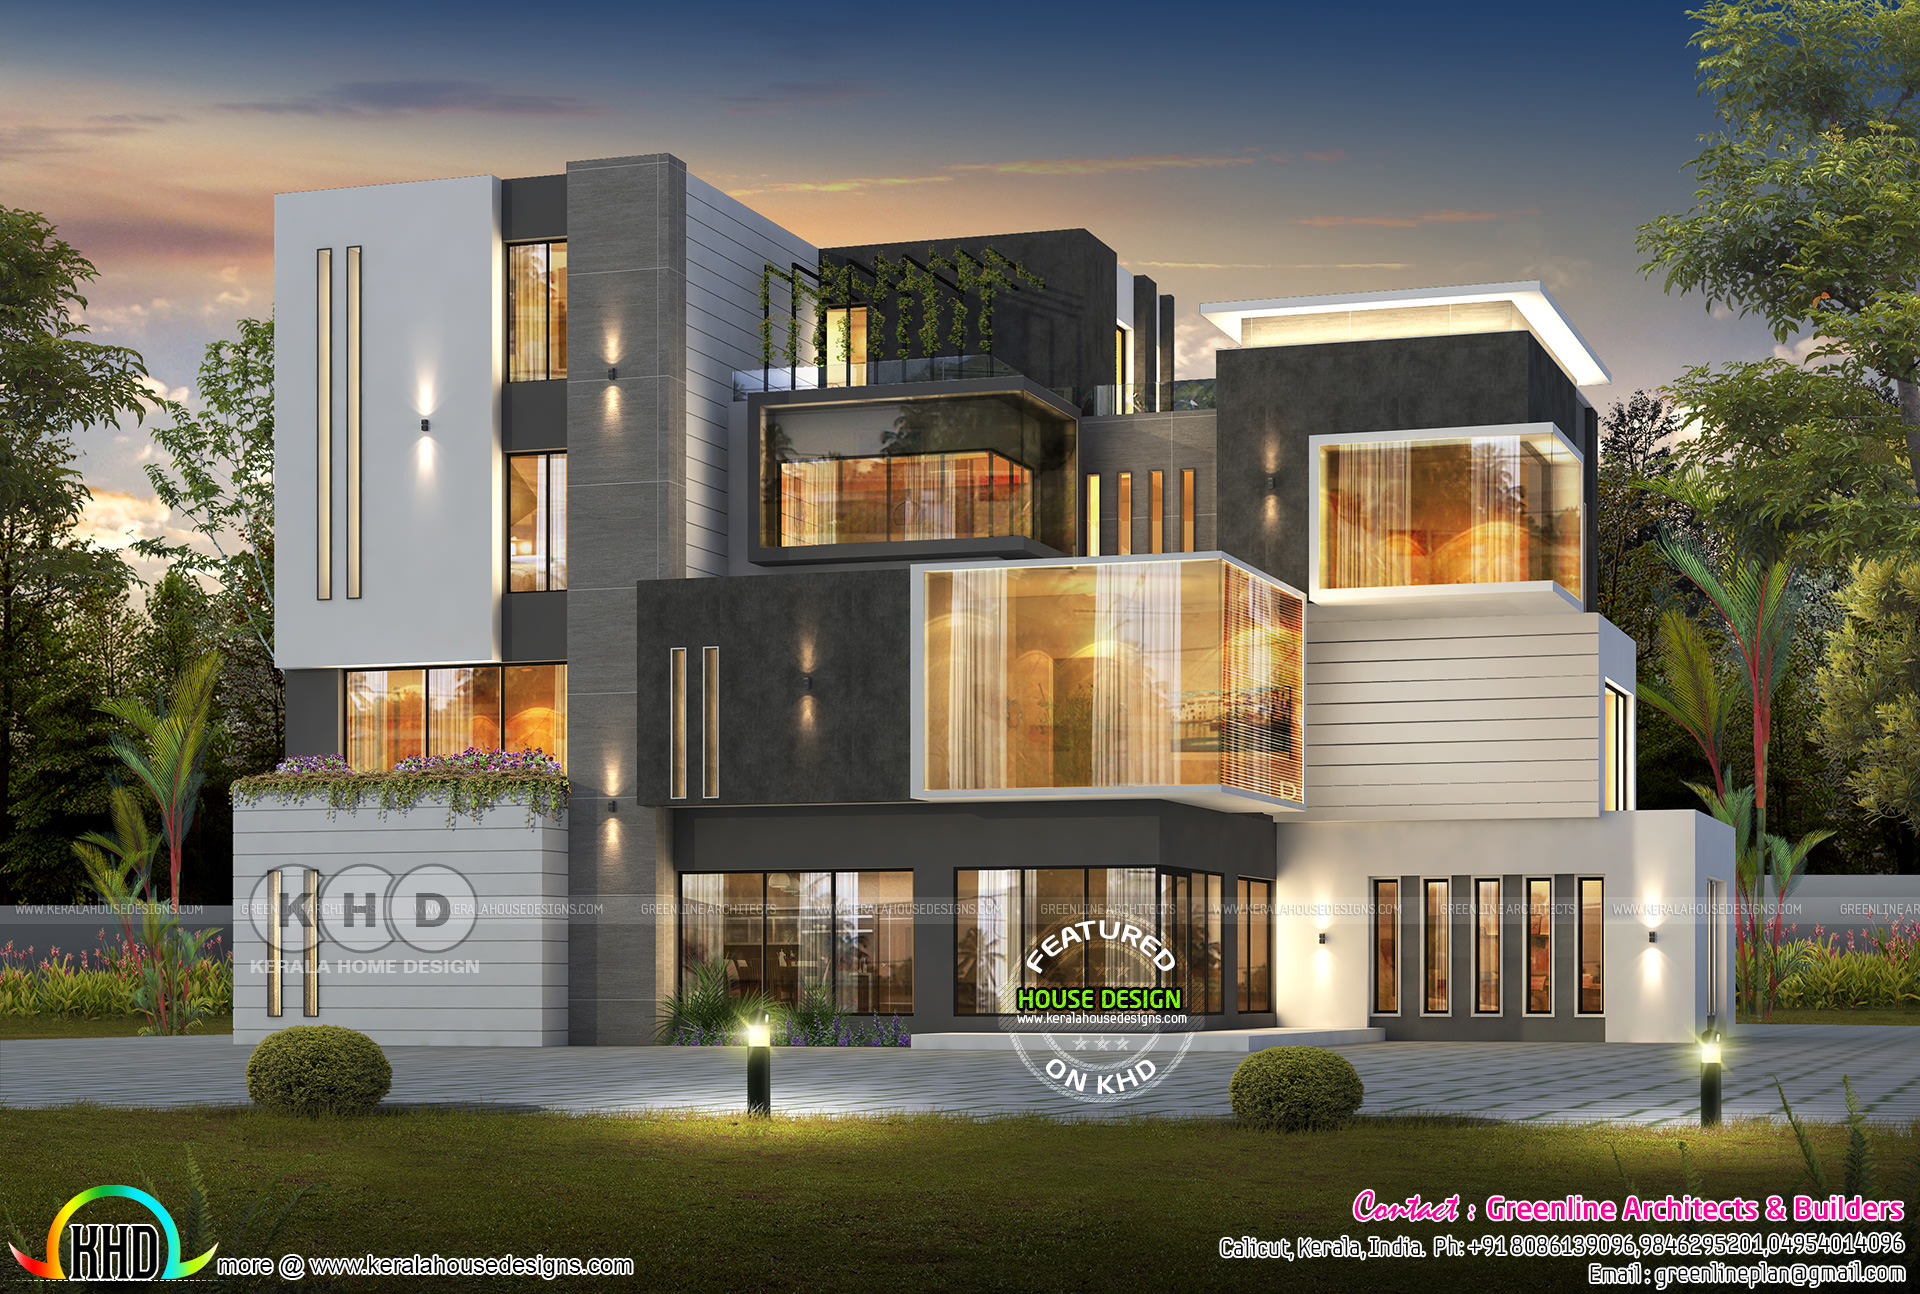 7 bedroom box model ultra modern home - Kerala home design ...